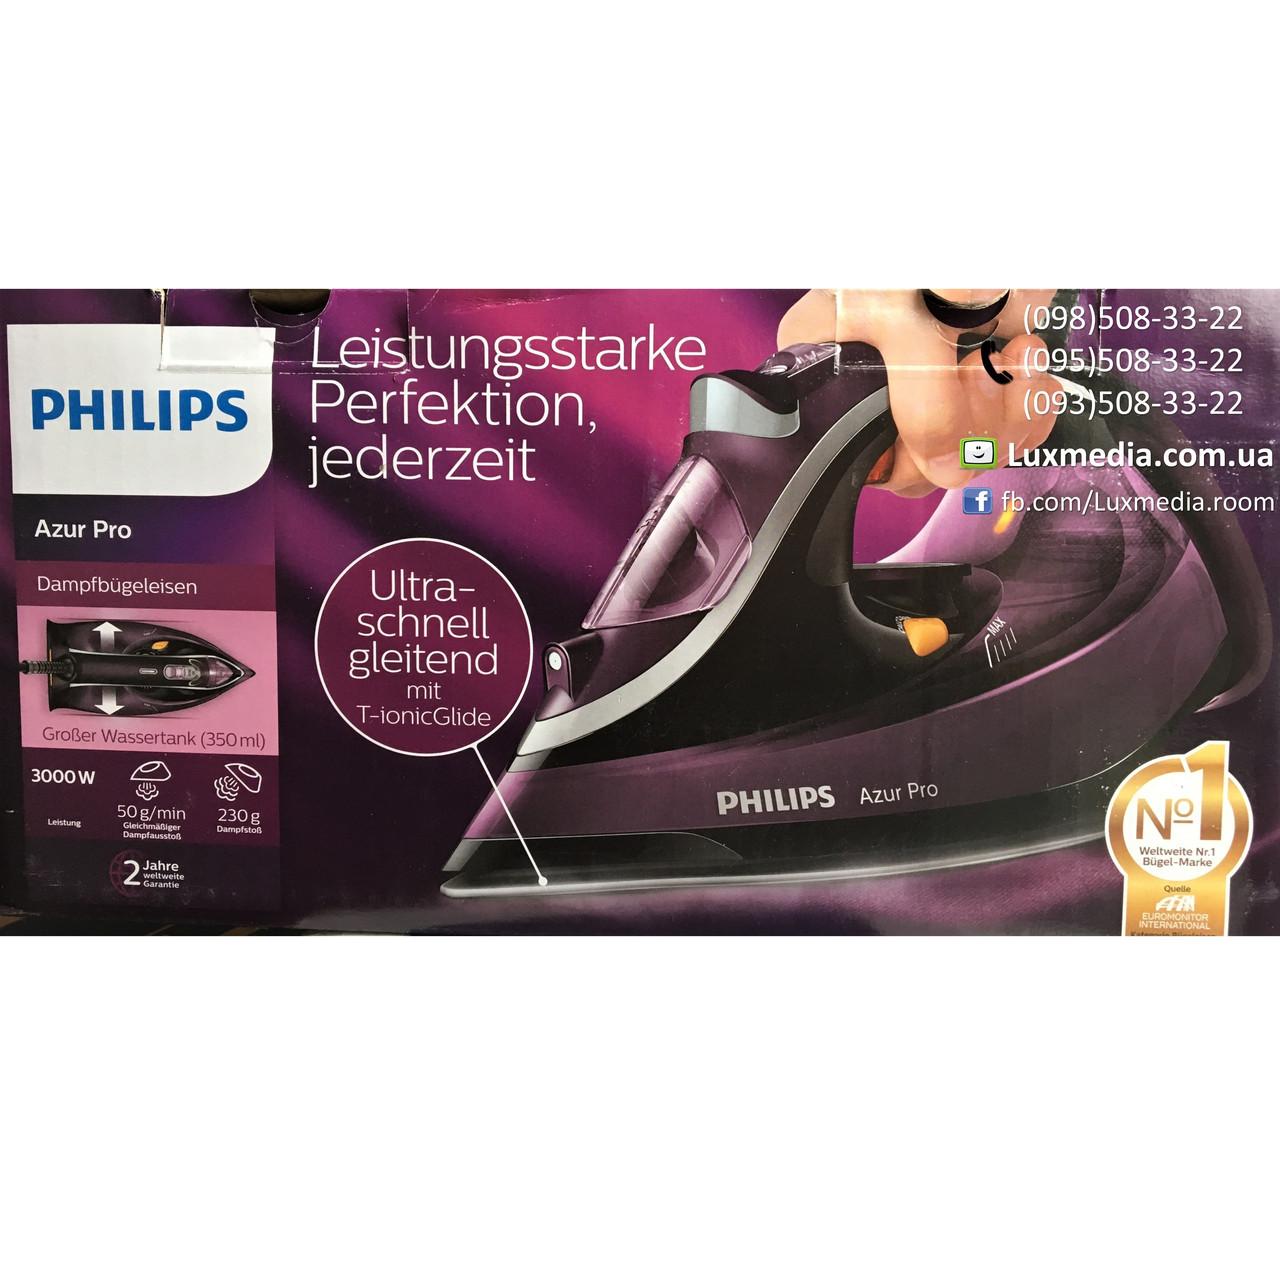 Паровой утюг Philips AZUR PRO GC4887/30 (3000 Вт, 50 г/мин, паровой удар 230 г, Подошва T-ionicGlide)